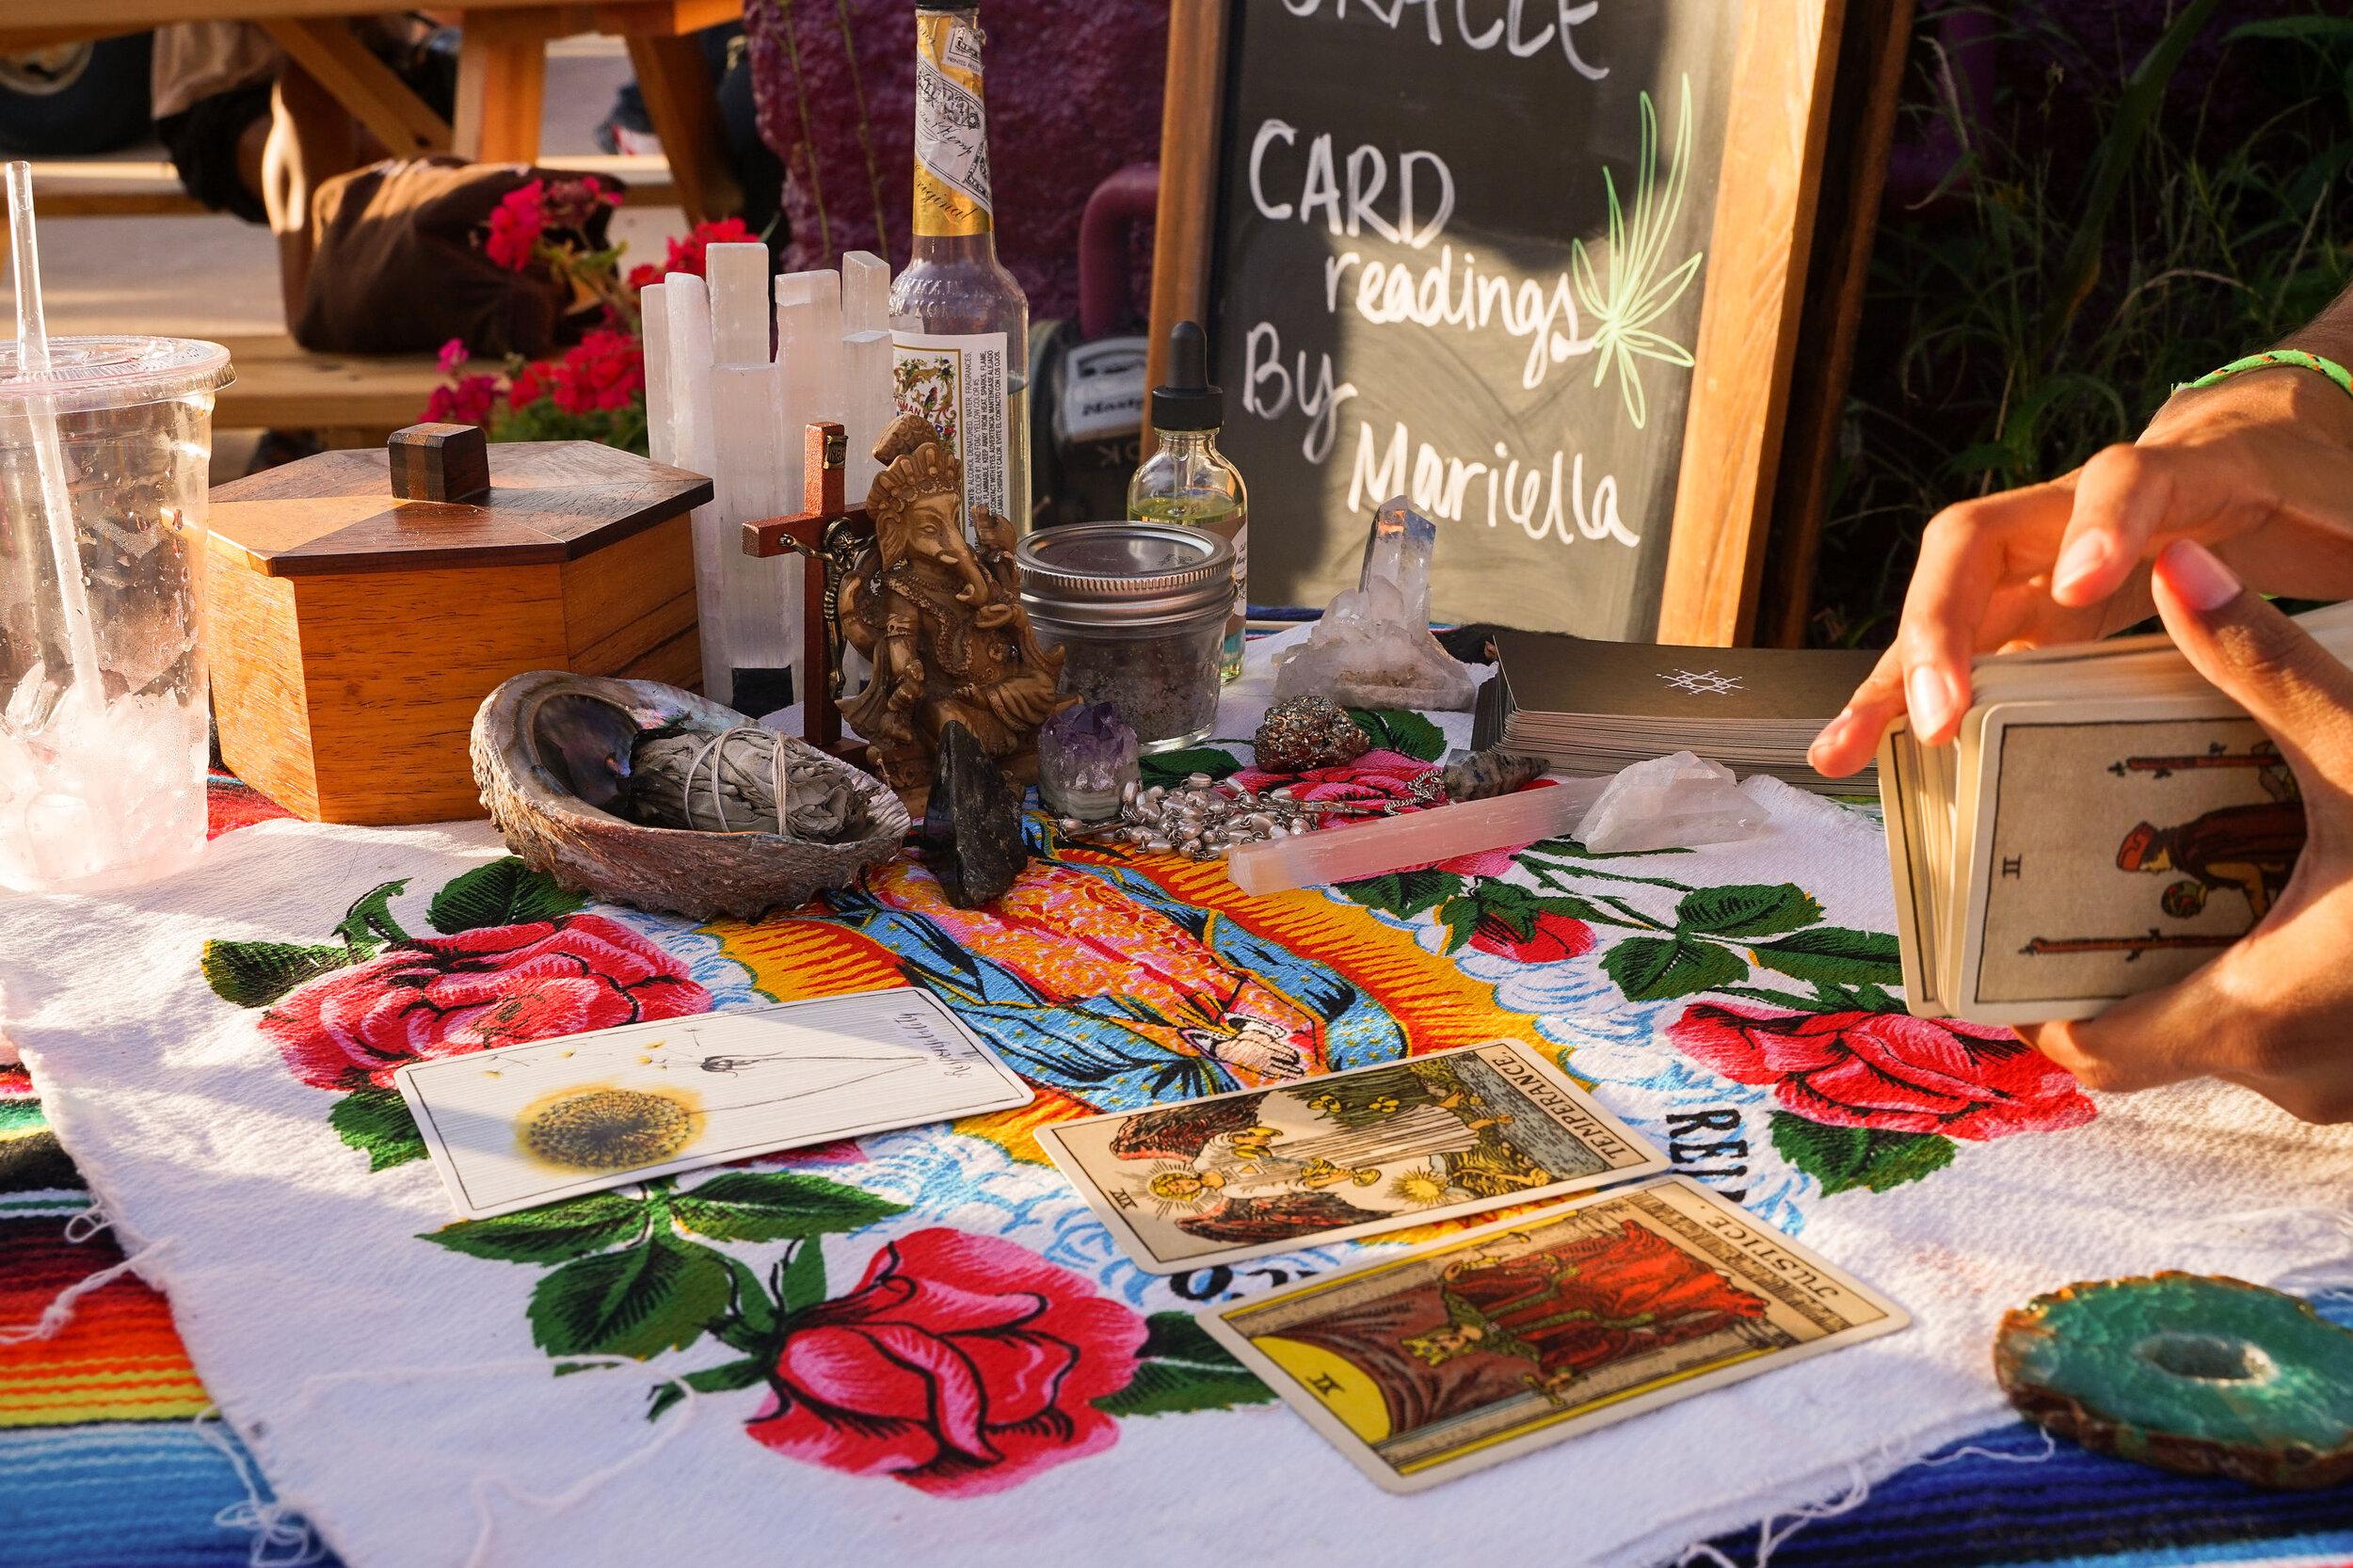 Oracle Card Readings at Bota Gala Night Market by Maricella Nayeri. Photograph by Charlie and Taylor Photography.